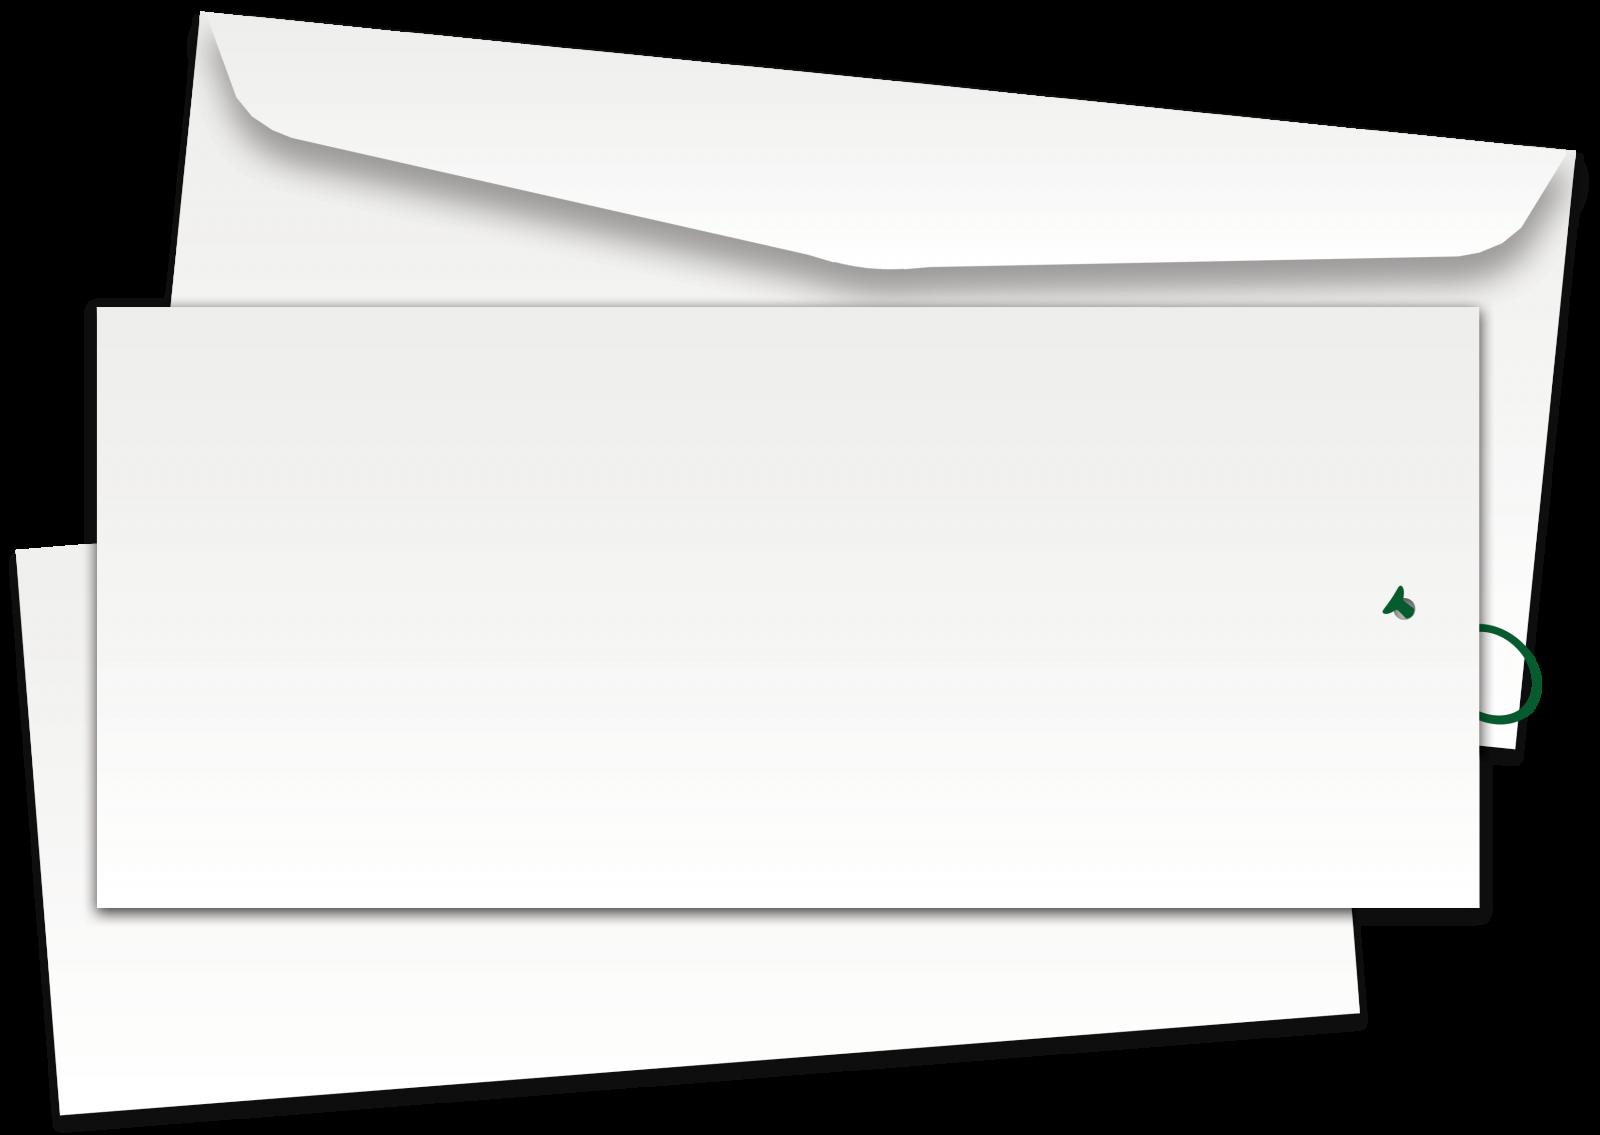 envelope clipart rectangle envelope